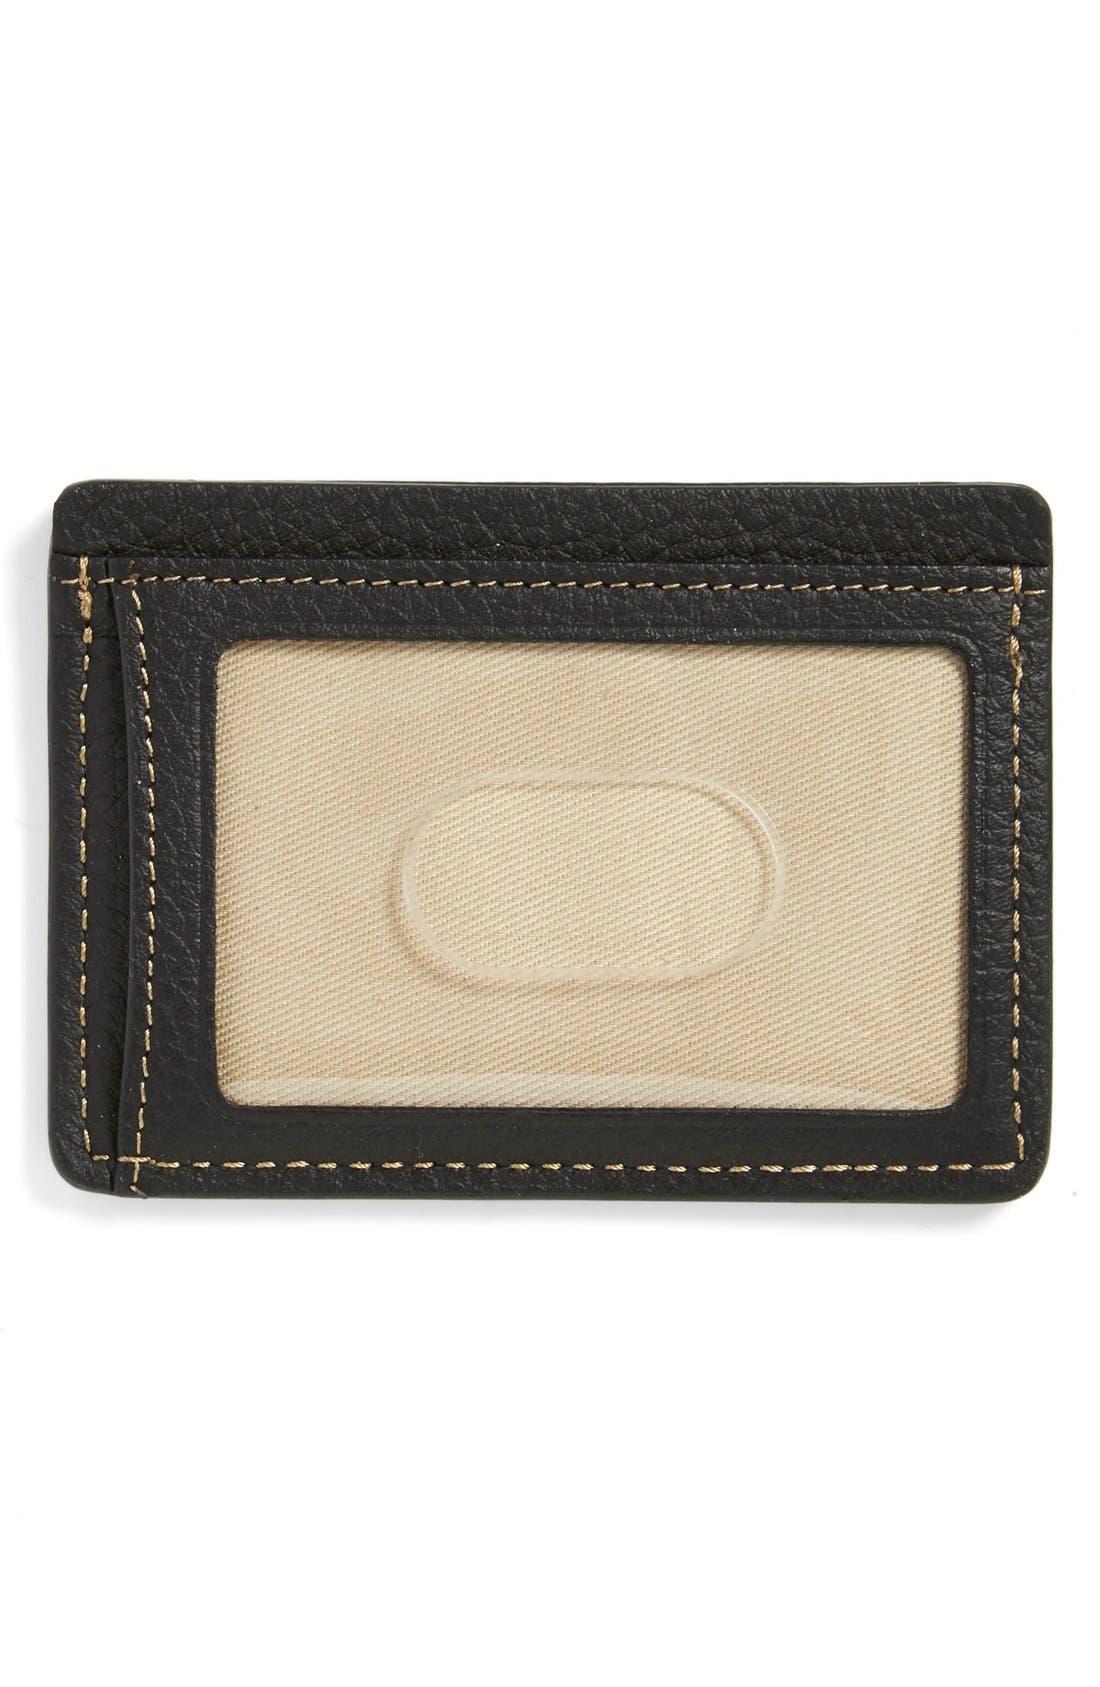 'Jackson' Norwegian Elk Leather Card Case,                             Alternate thumbnail 2, color,                             BLACK NORWEGIAN ELK